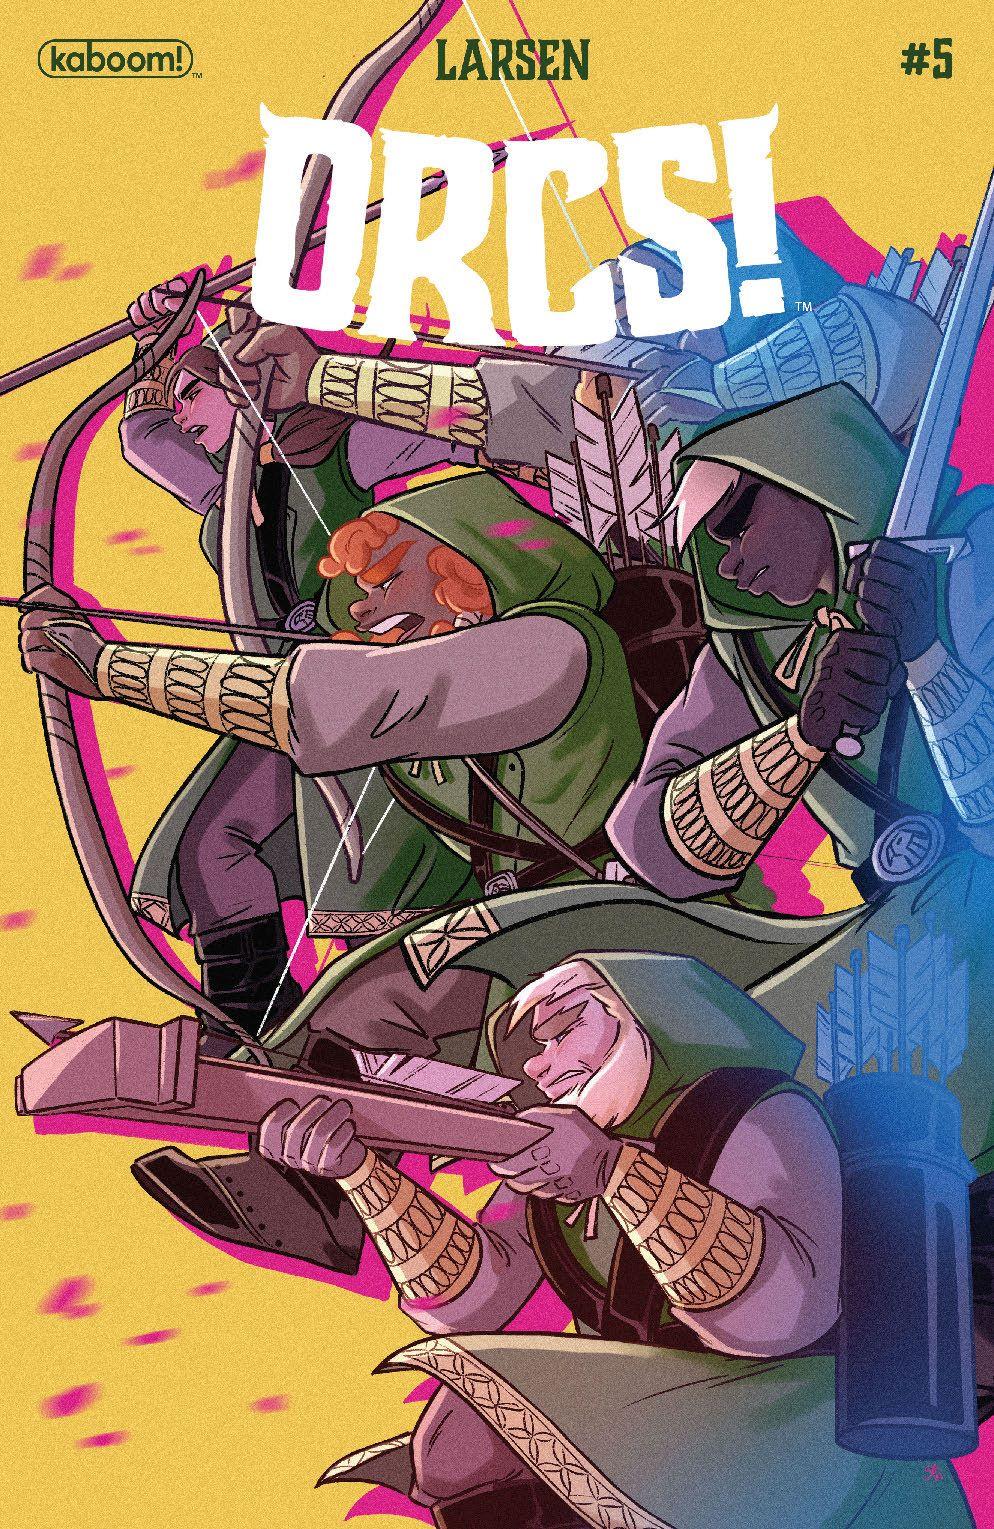 Orcs_005_Cover_B_Variant-1 ComicList Previews: ORCS #5 (OF 6)